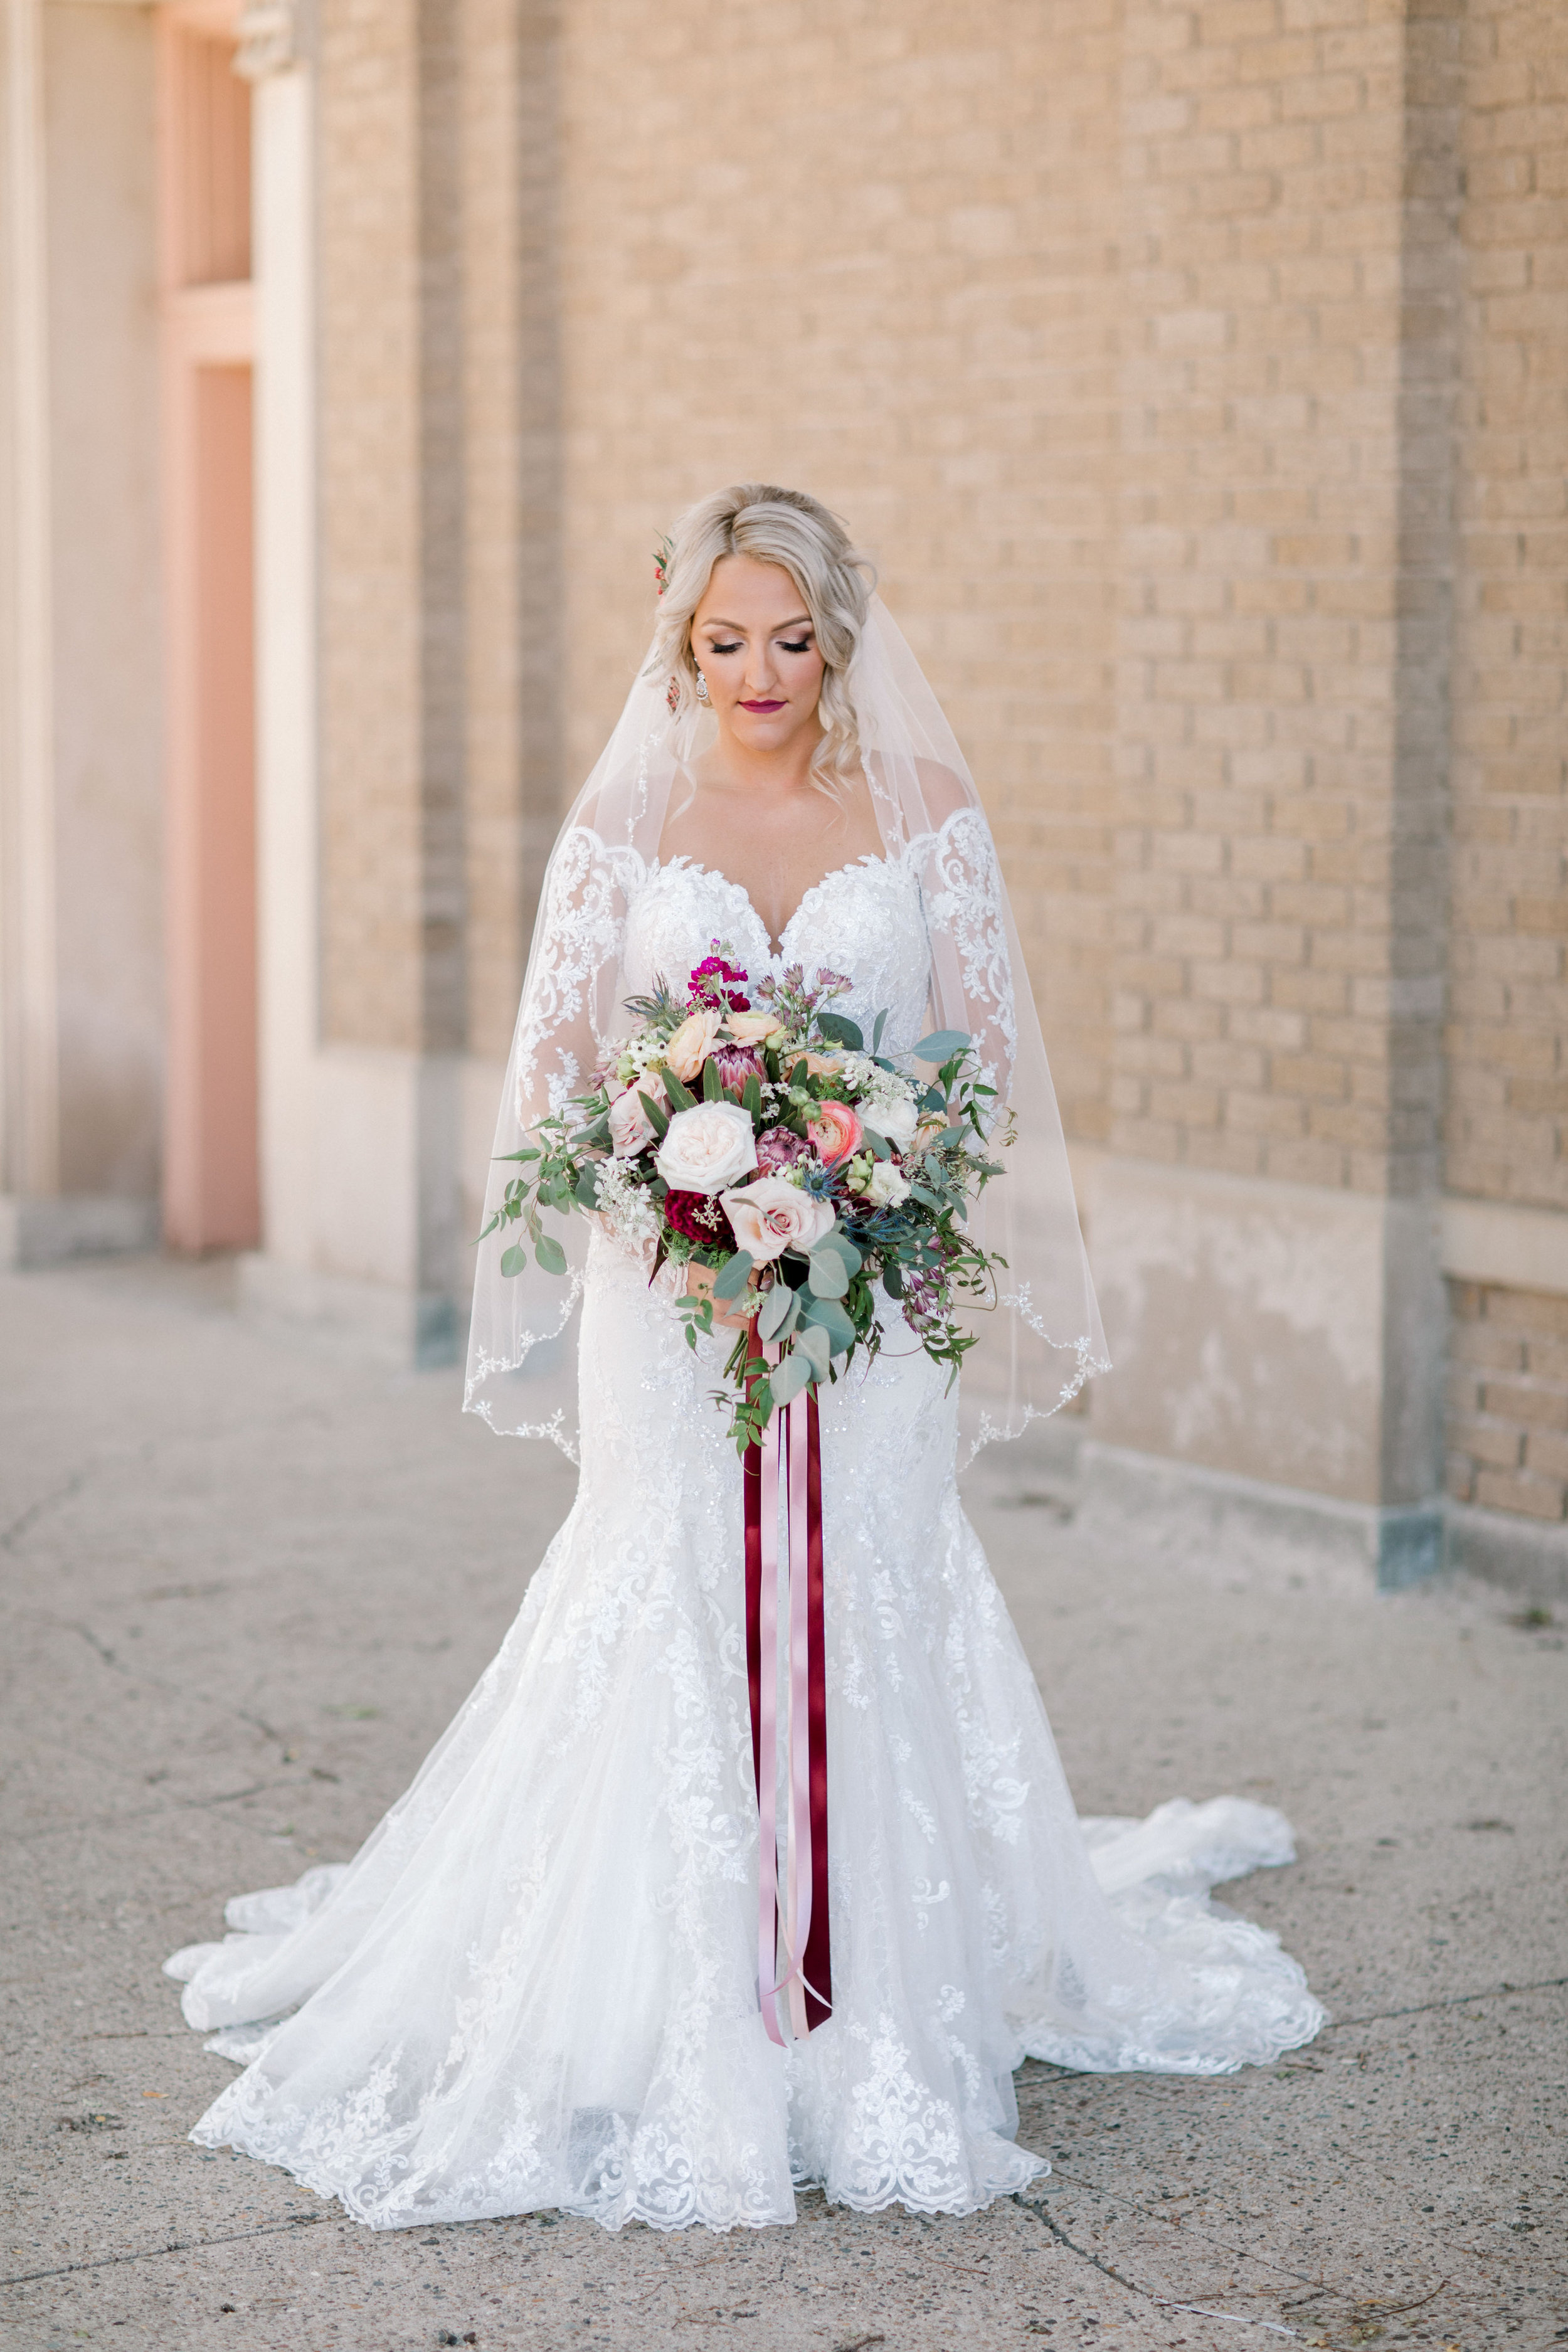 Ryan Alexa Married-Portraits-0046.jpg